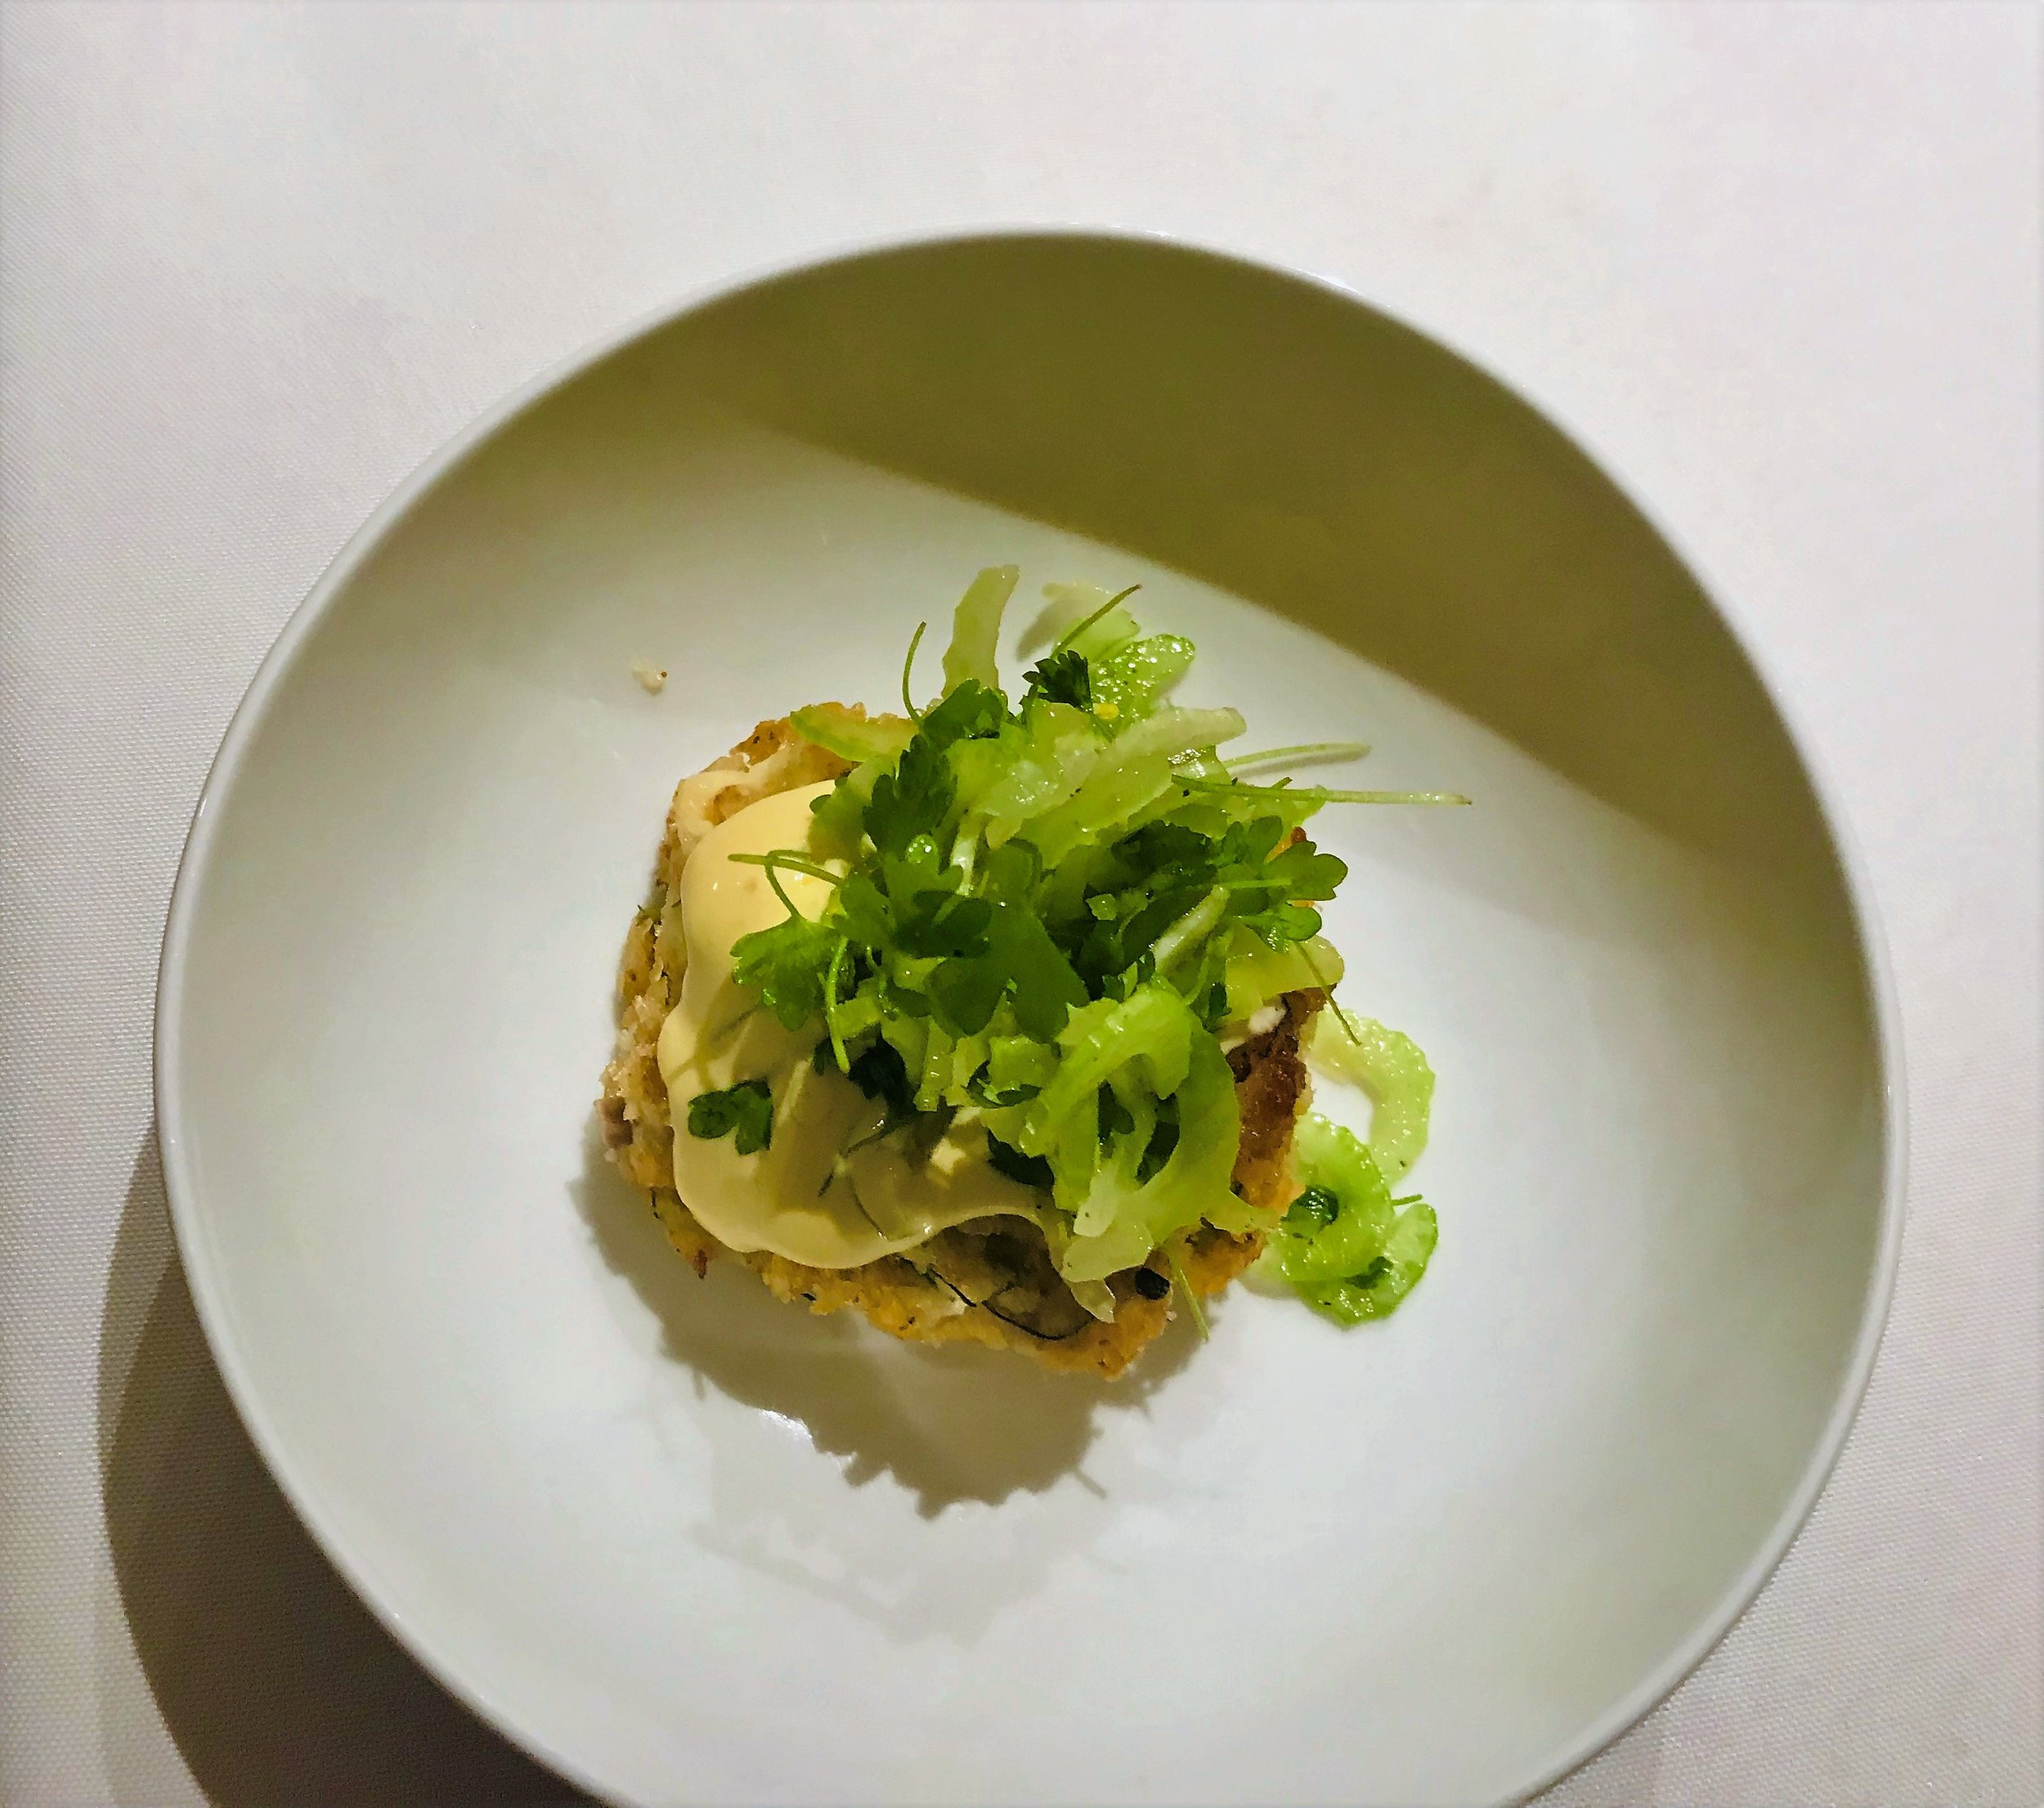 cod cake, saffron aioli, celery salad, lemon vinaigrette.JPG